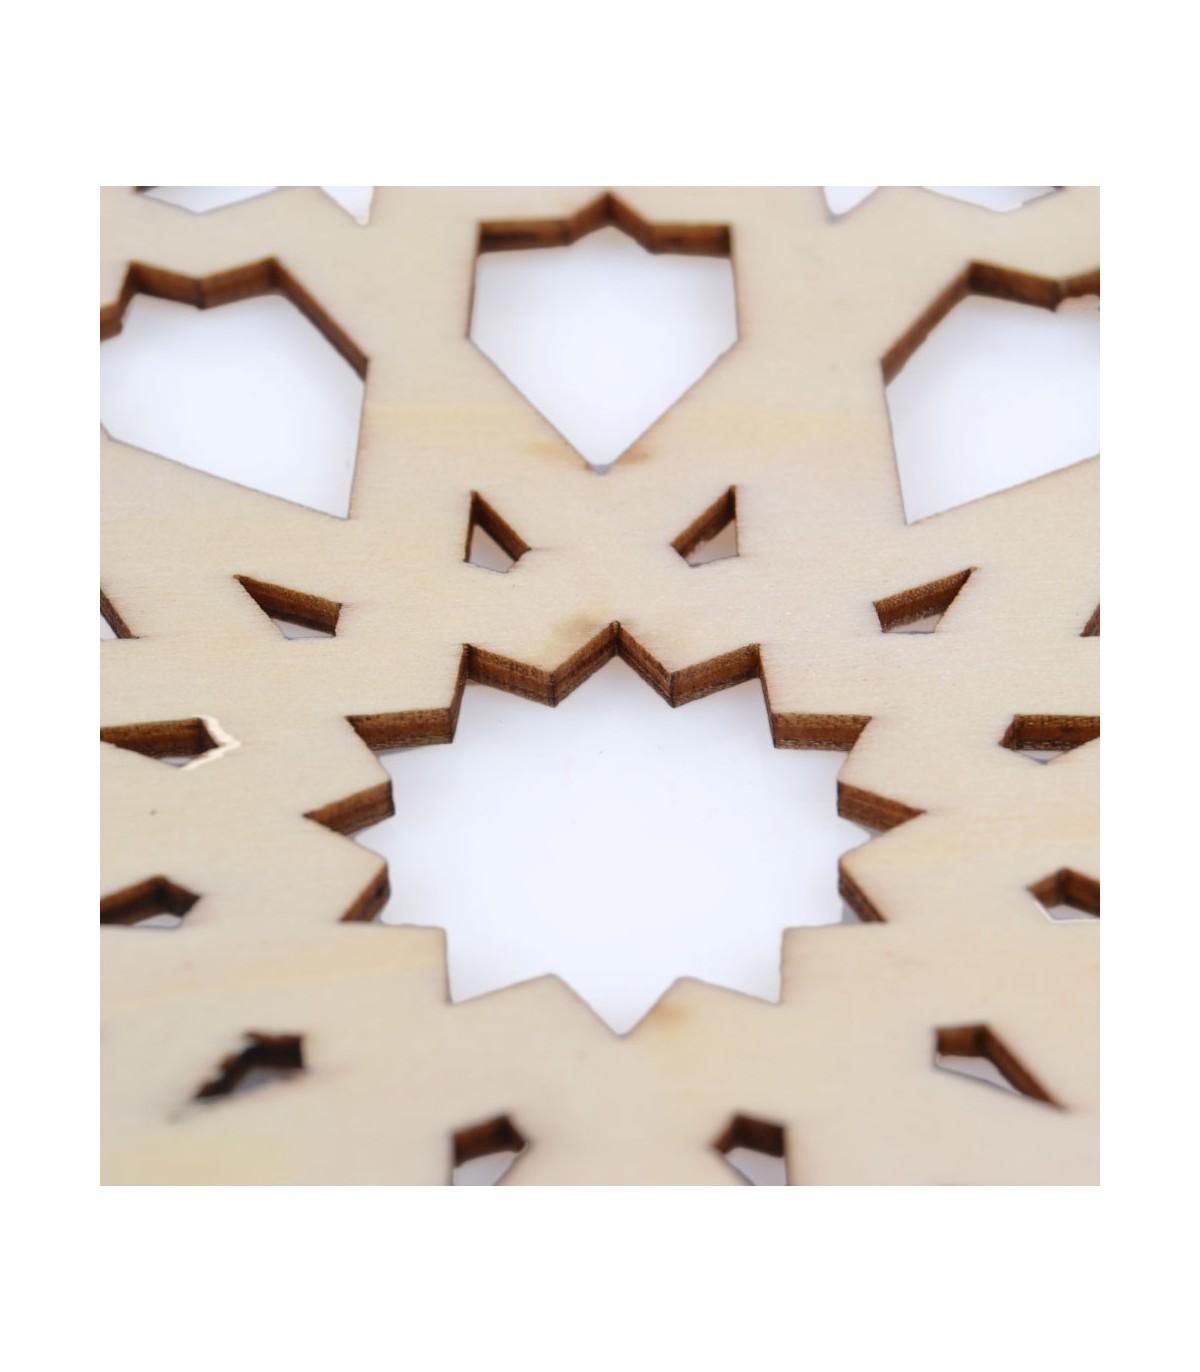 Arab Lattice Openwork - Glass Beaker - Wood - Model 9 - 10